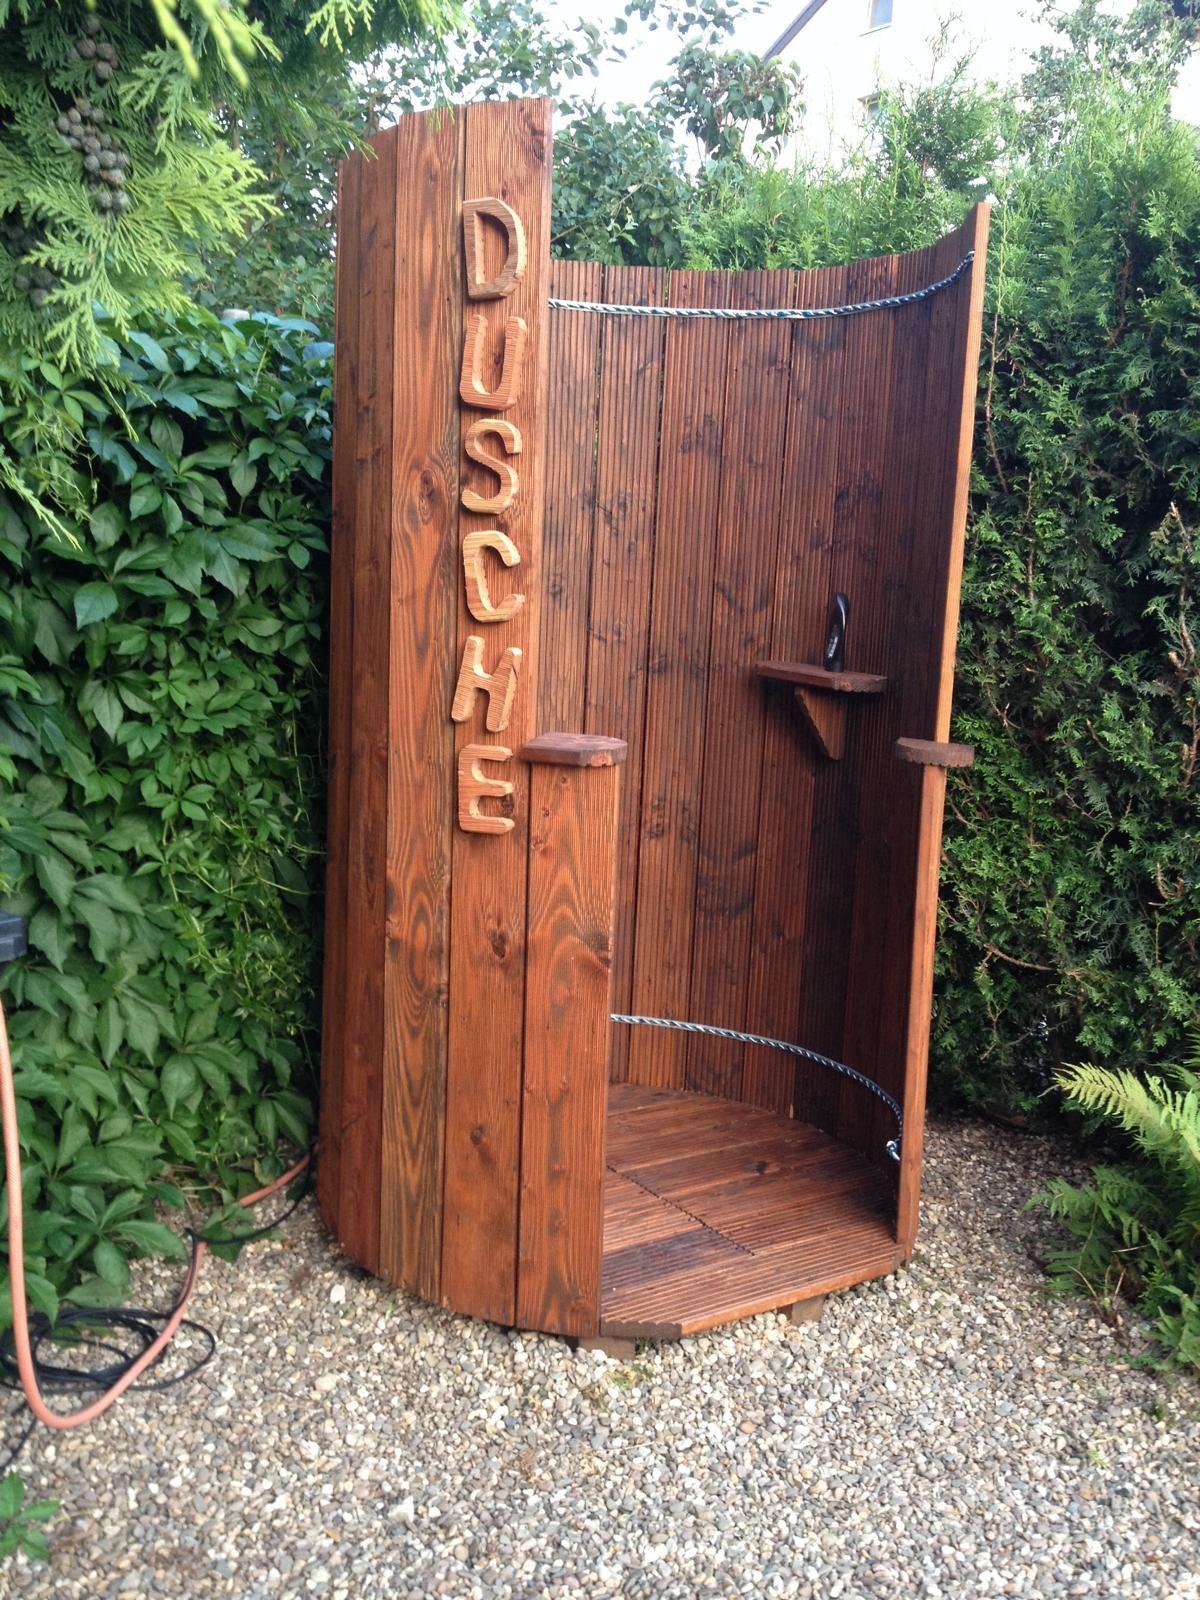 gartendusche bauanleitung zum selber bauen heimwerker forum tletek pinterest saunas. Black Bedroom Furniture Sets. Home Design Ideas